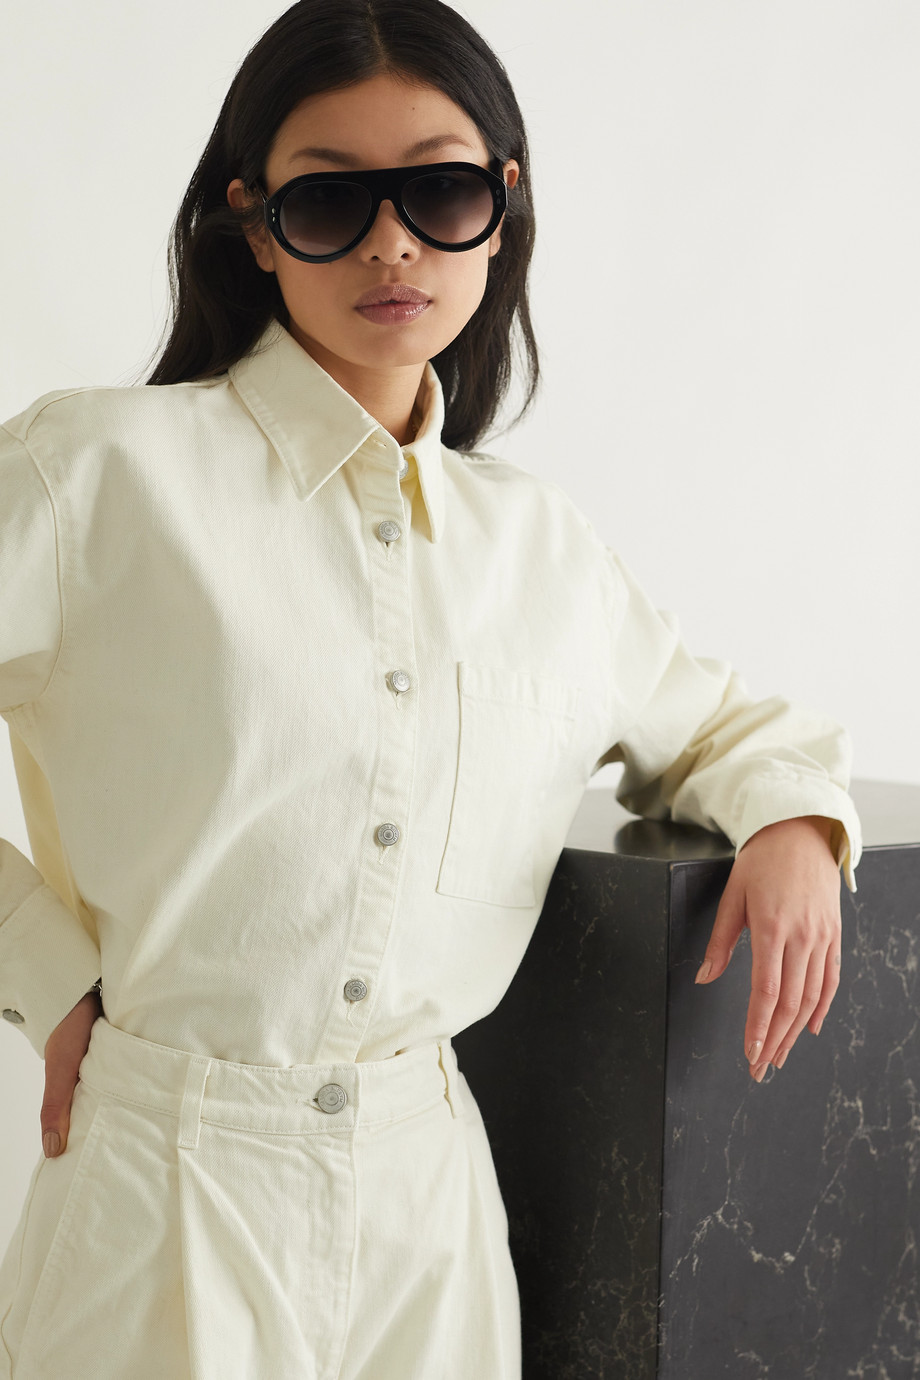 Isabel Marant D-frame acetate sunglasses